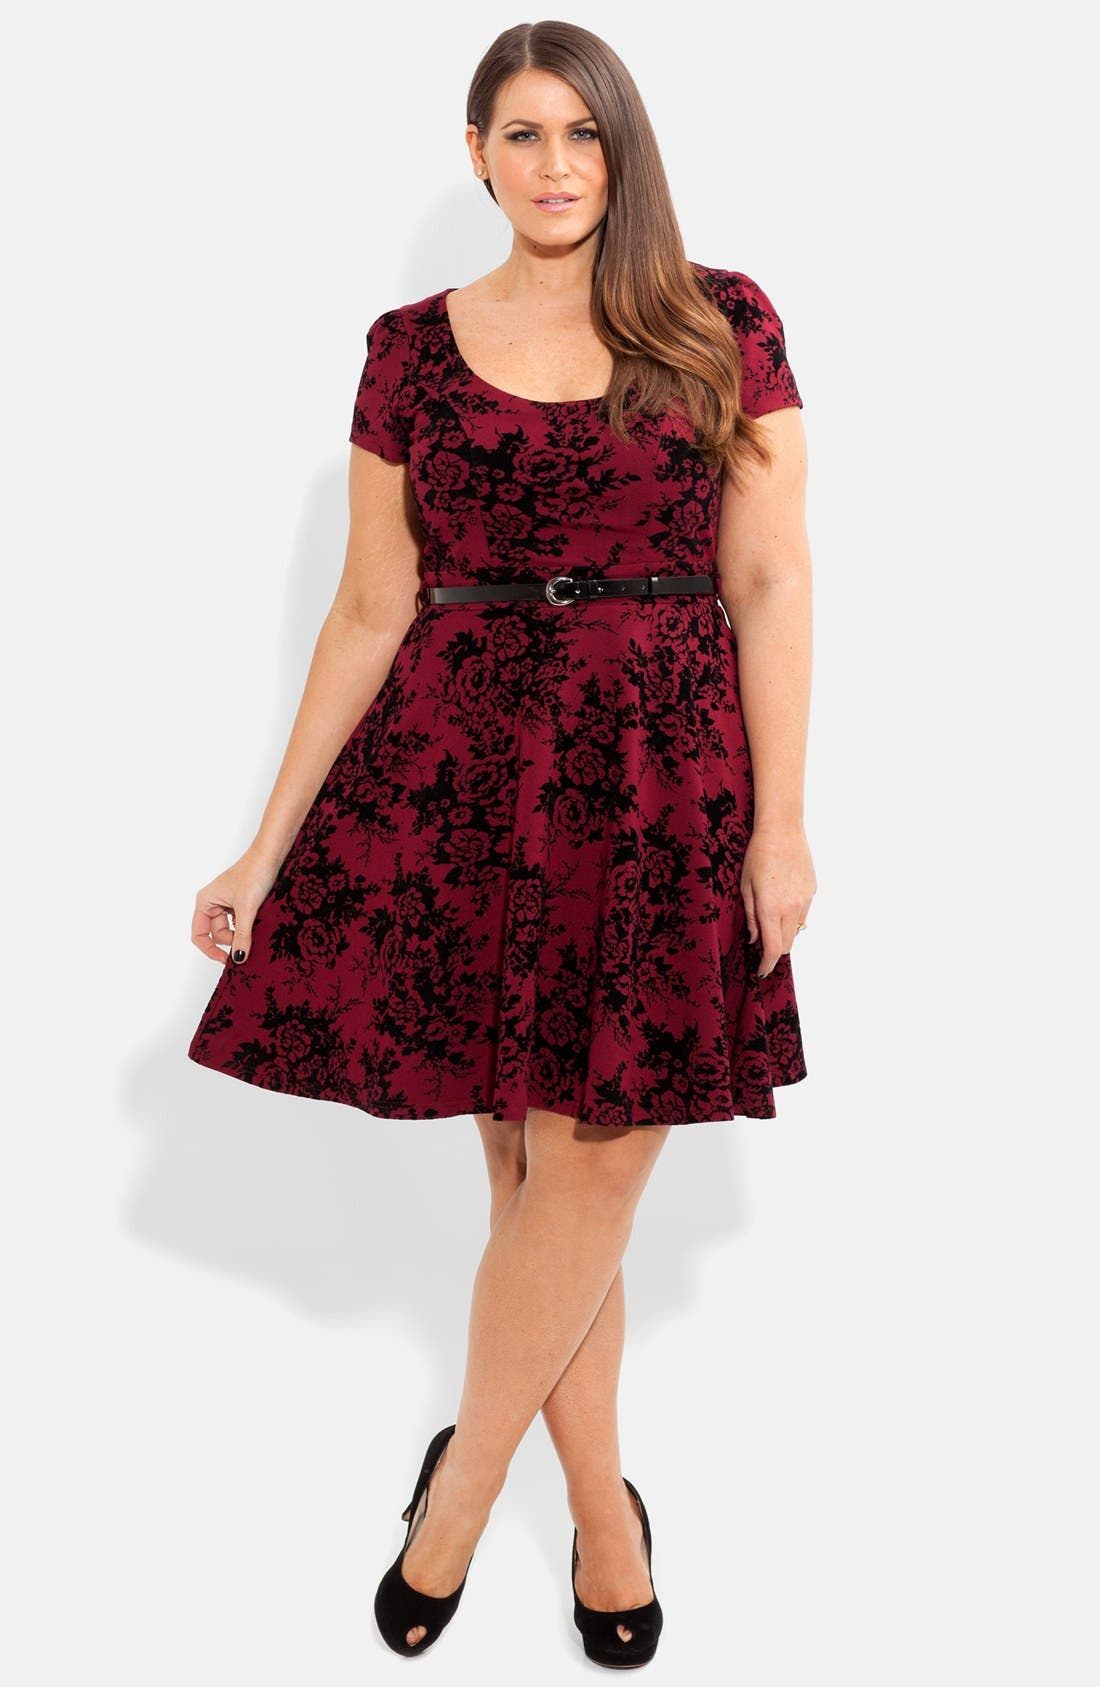 Main Image - City Chic Floral Print Skater Dress (Plus Size)